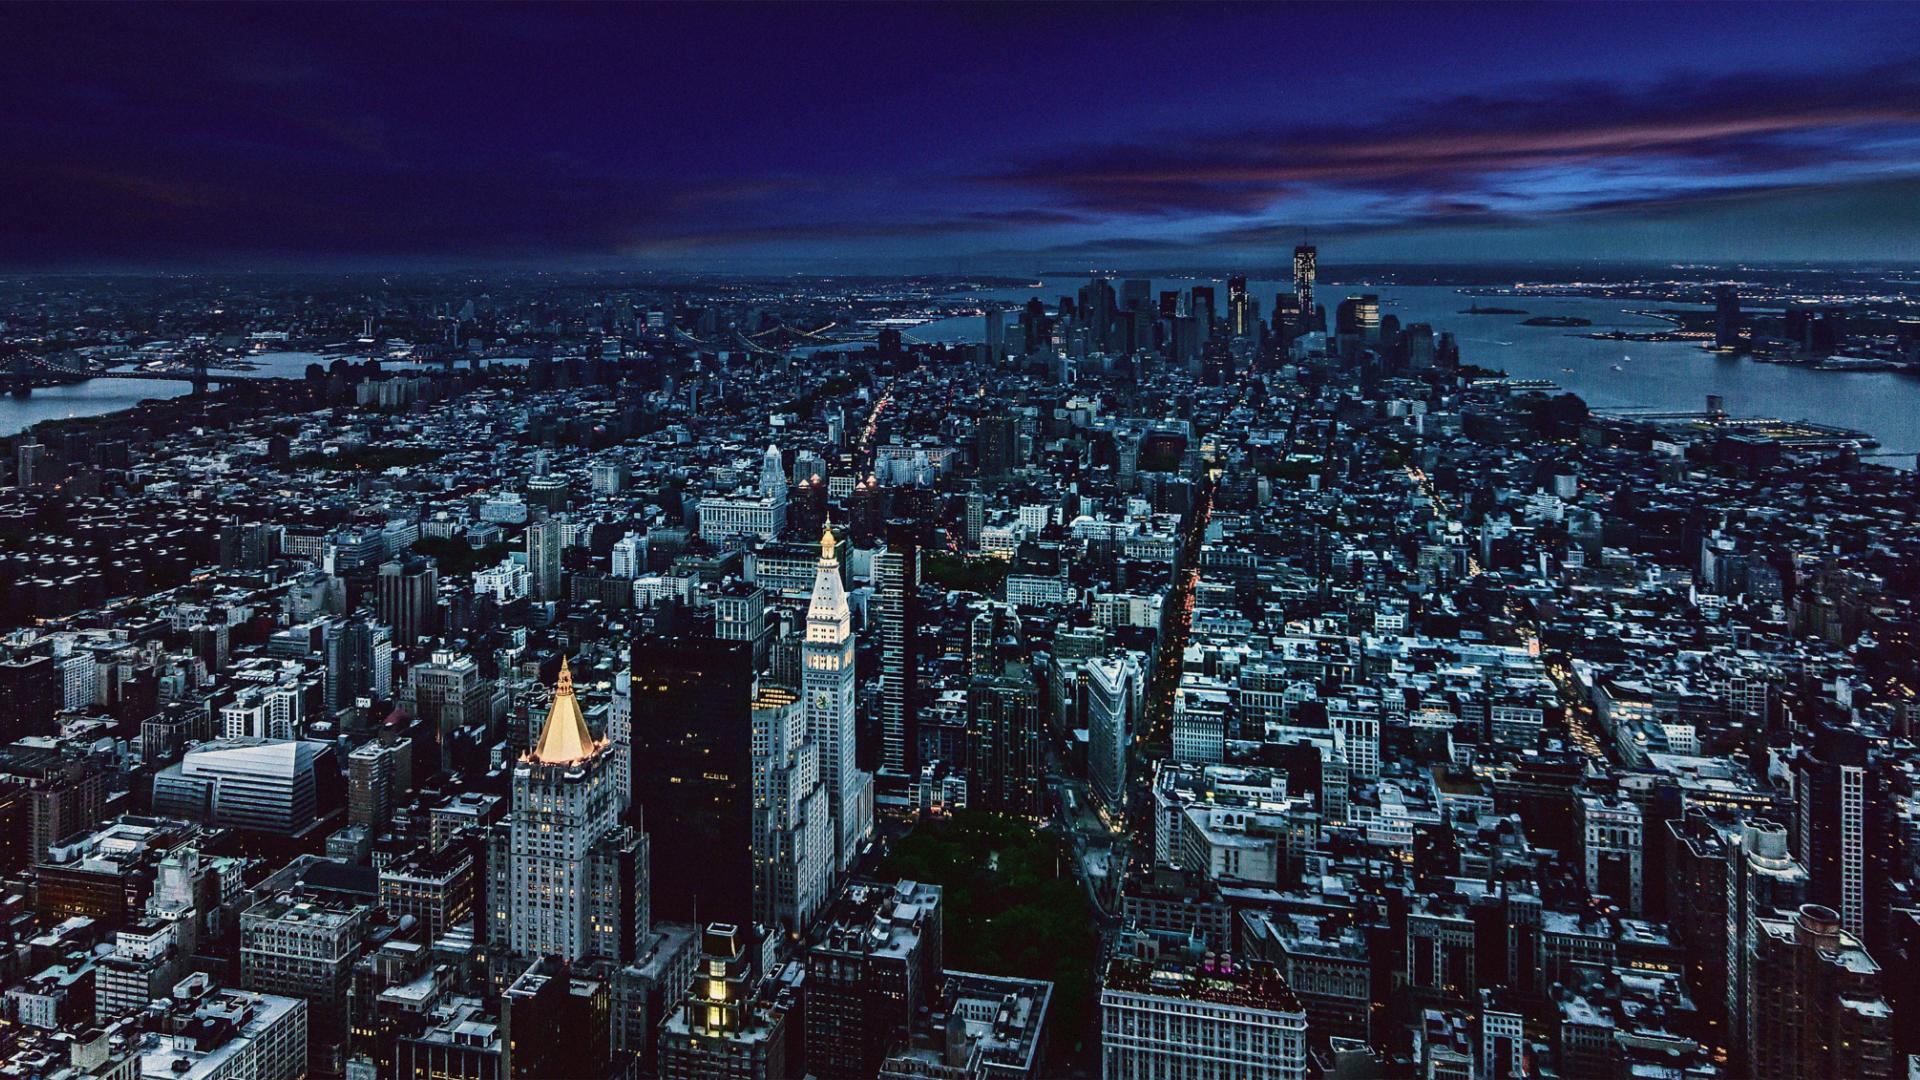 1920x1080 Wallpaper New York City Night Aerial View